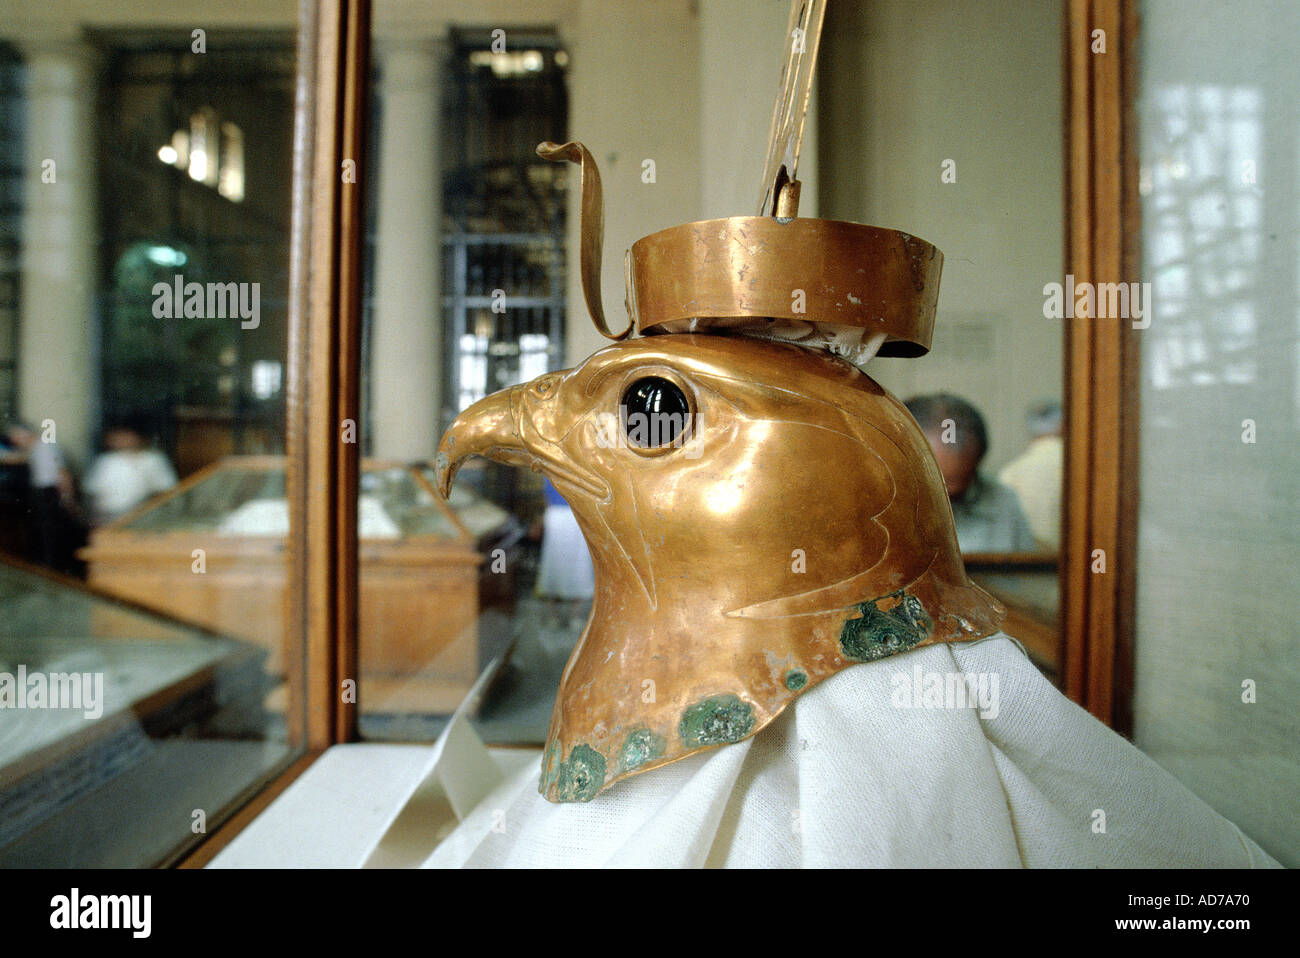 EGYPT CAIRO ANTIQUES MUSEUM PHARAOH TUT EN KAMON GRAVE ARTIFACTS HEAD OF HORUS THE FALCON GOD - Stock Image